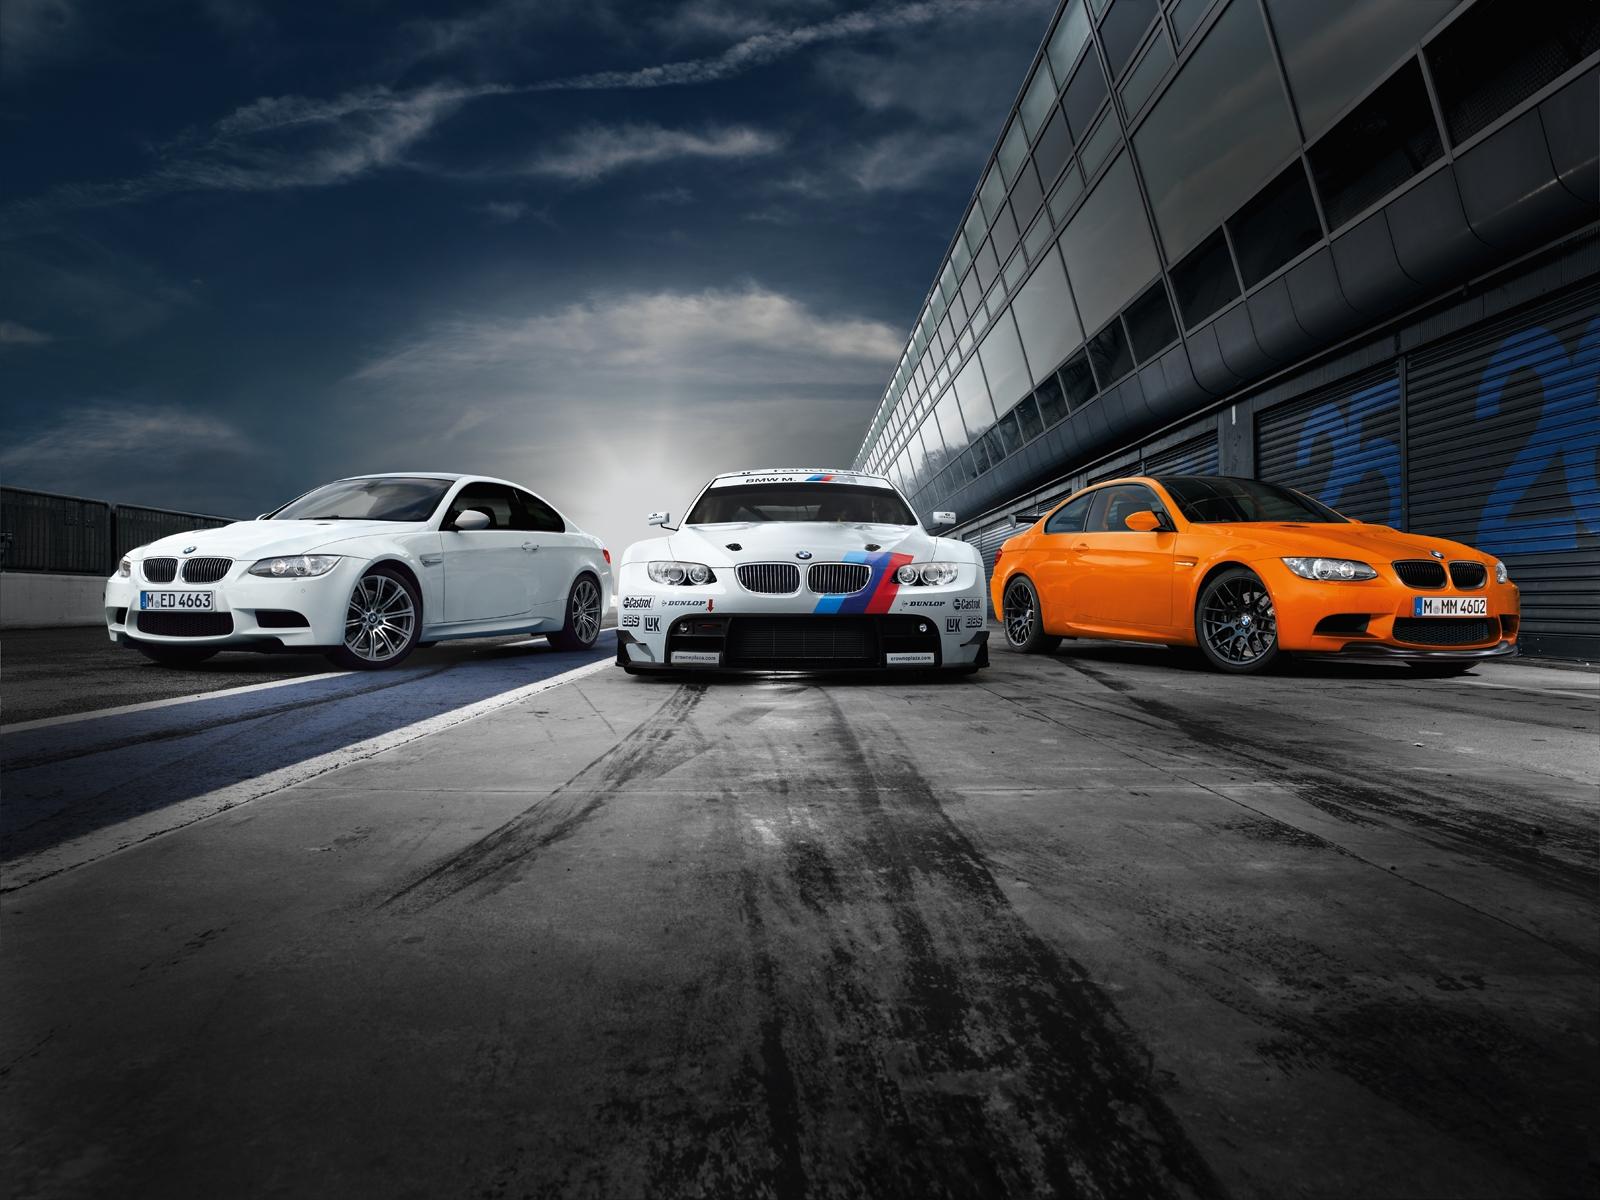 BMW M3 WallpapersBmw m3 wallpaper Bmw m3 wallpaper 1600x1200